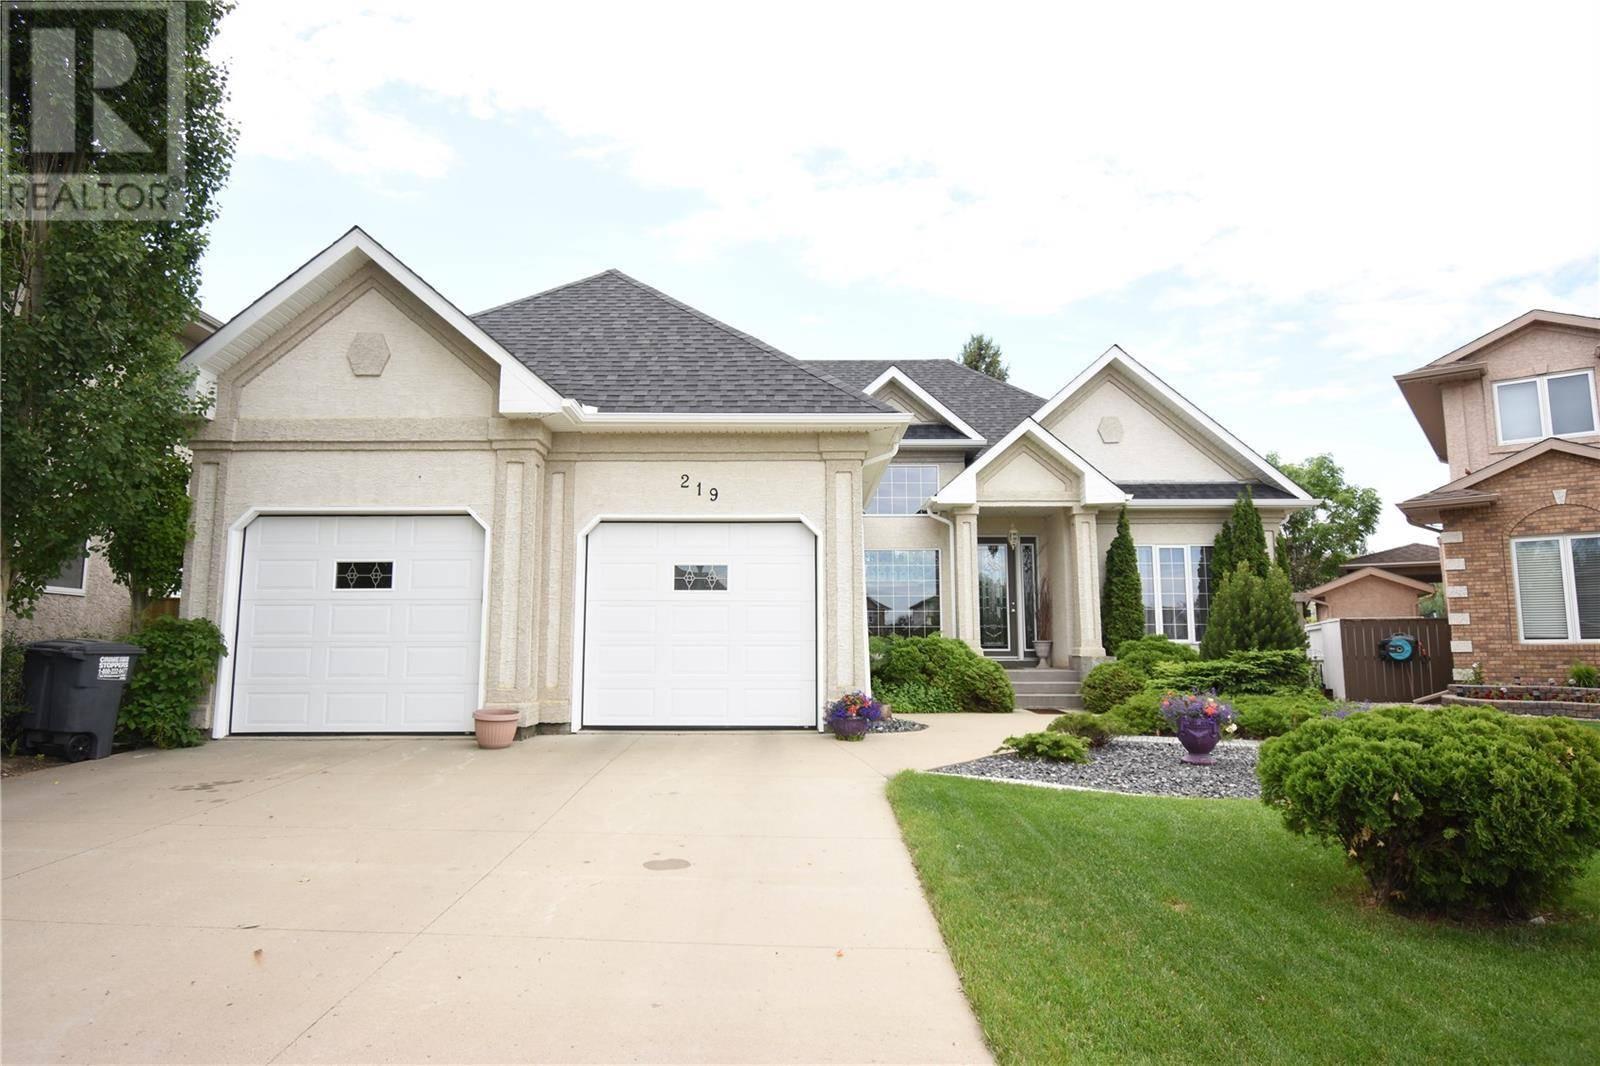 House for sale at 219 Wright Cres Saskatoon Saskatchewan - MLS: SK773584